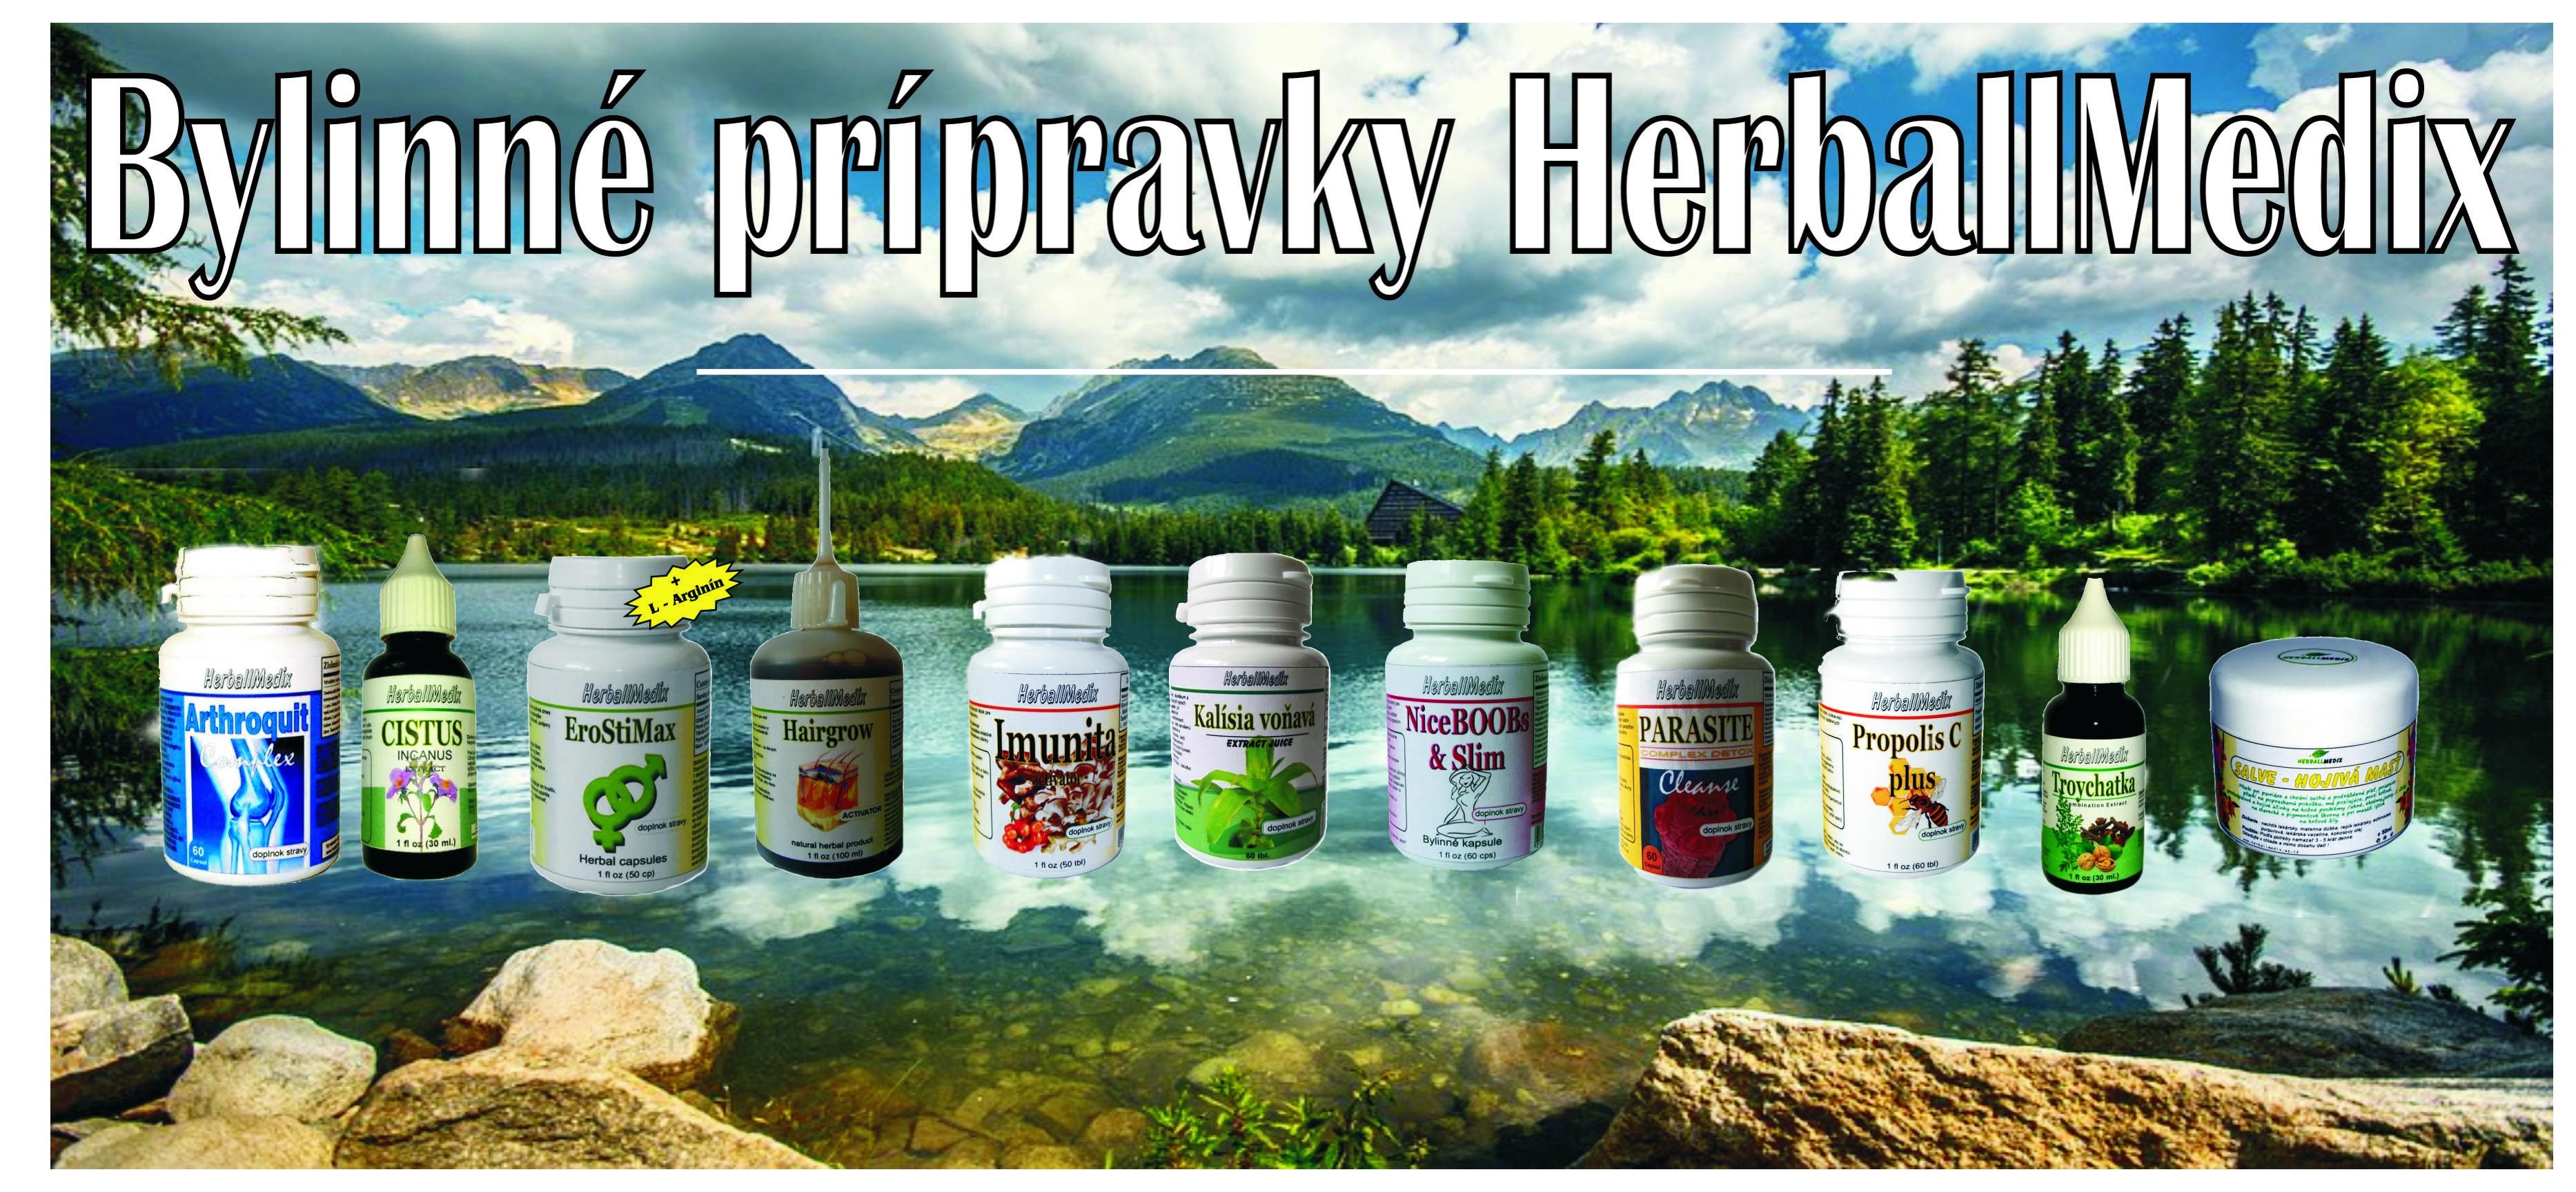 Bylinné produkty HerballMedix